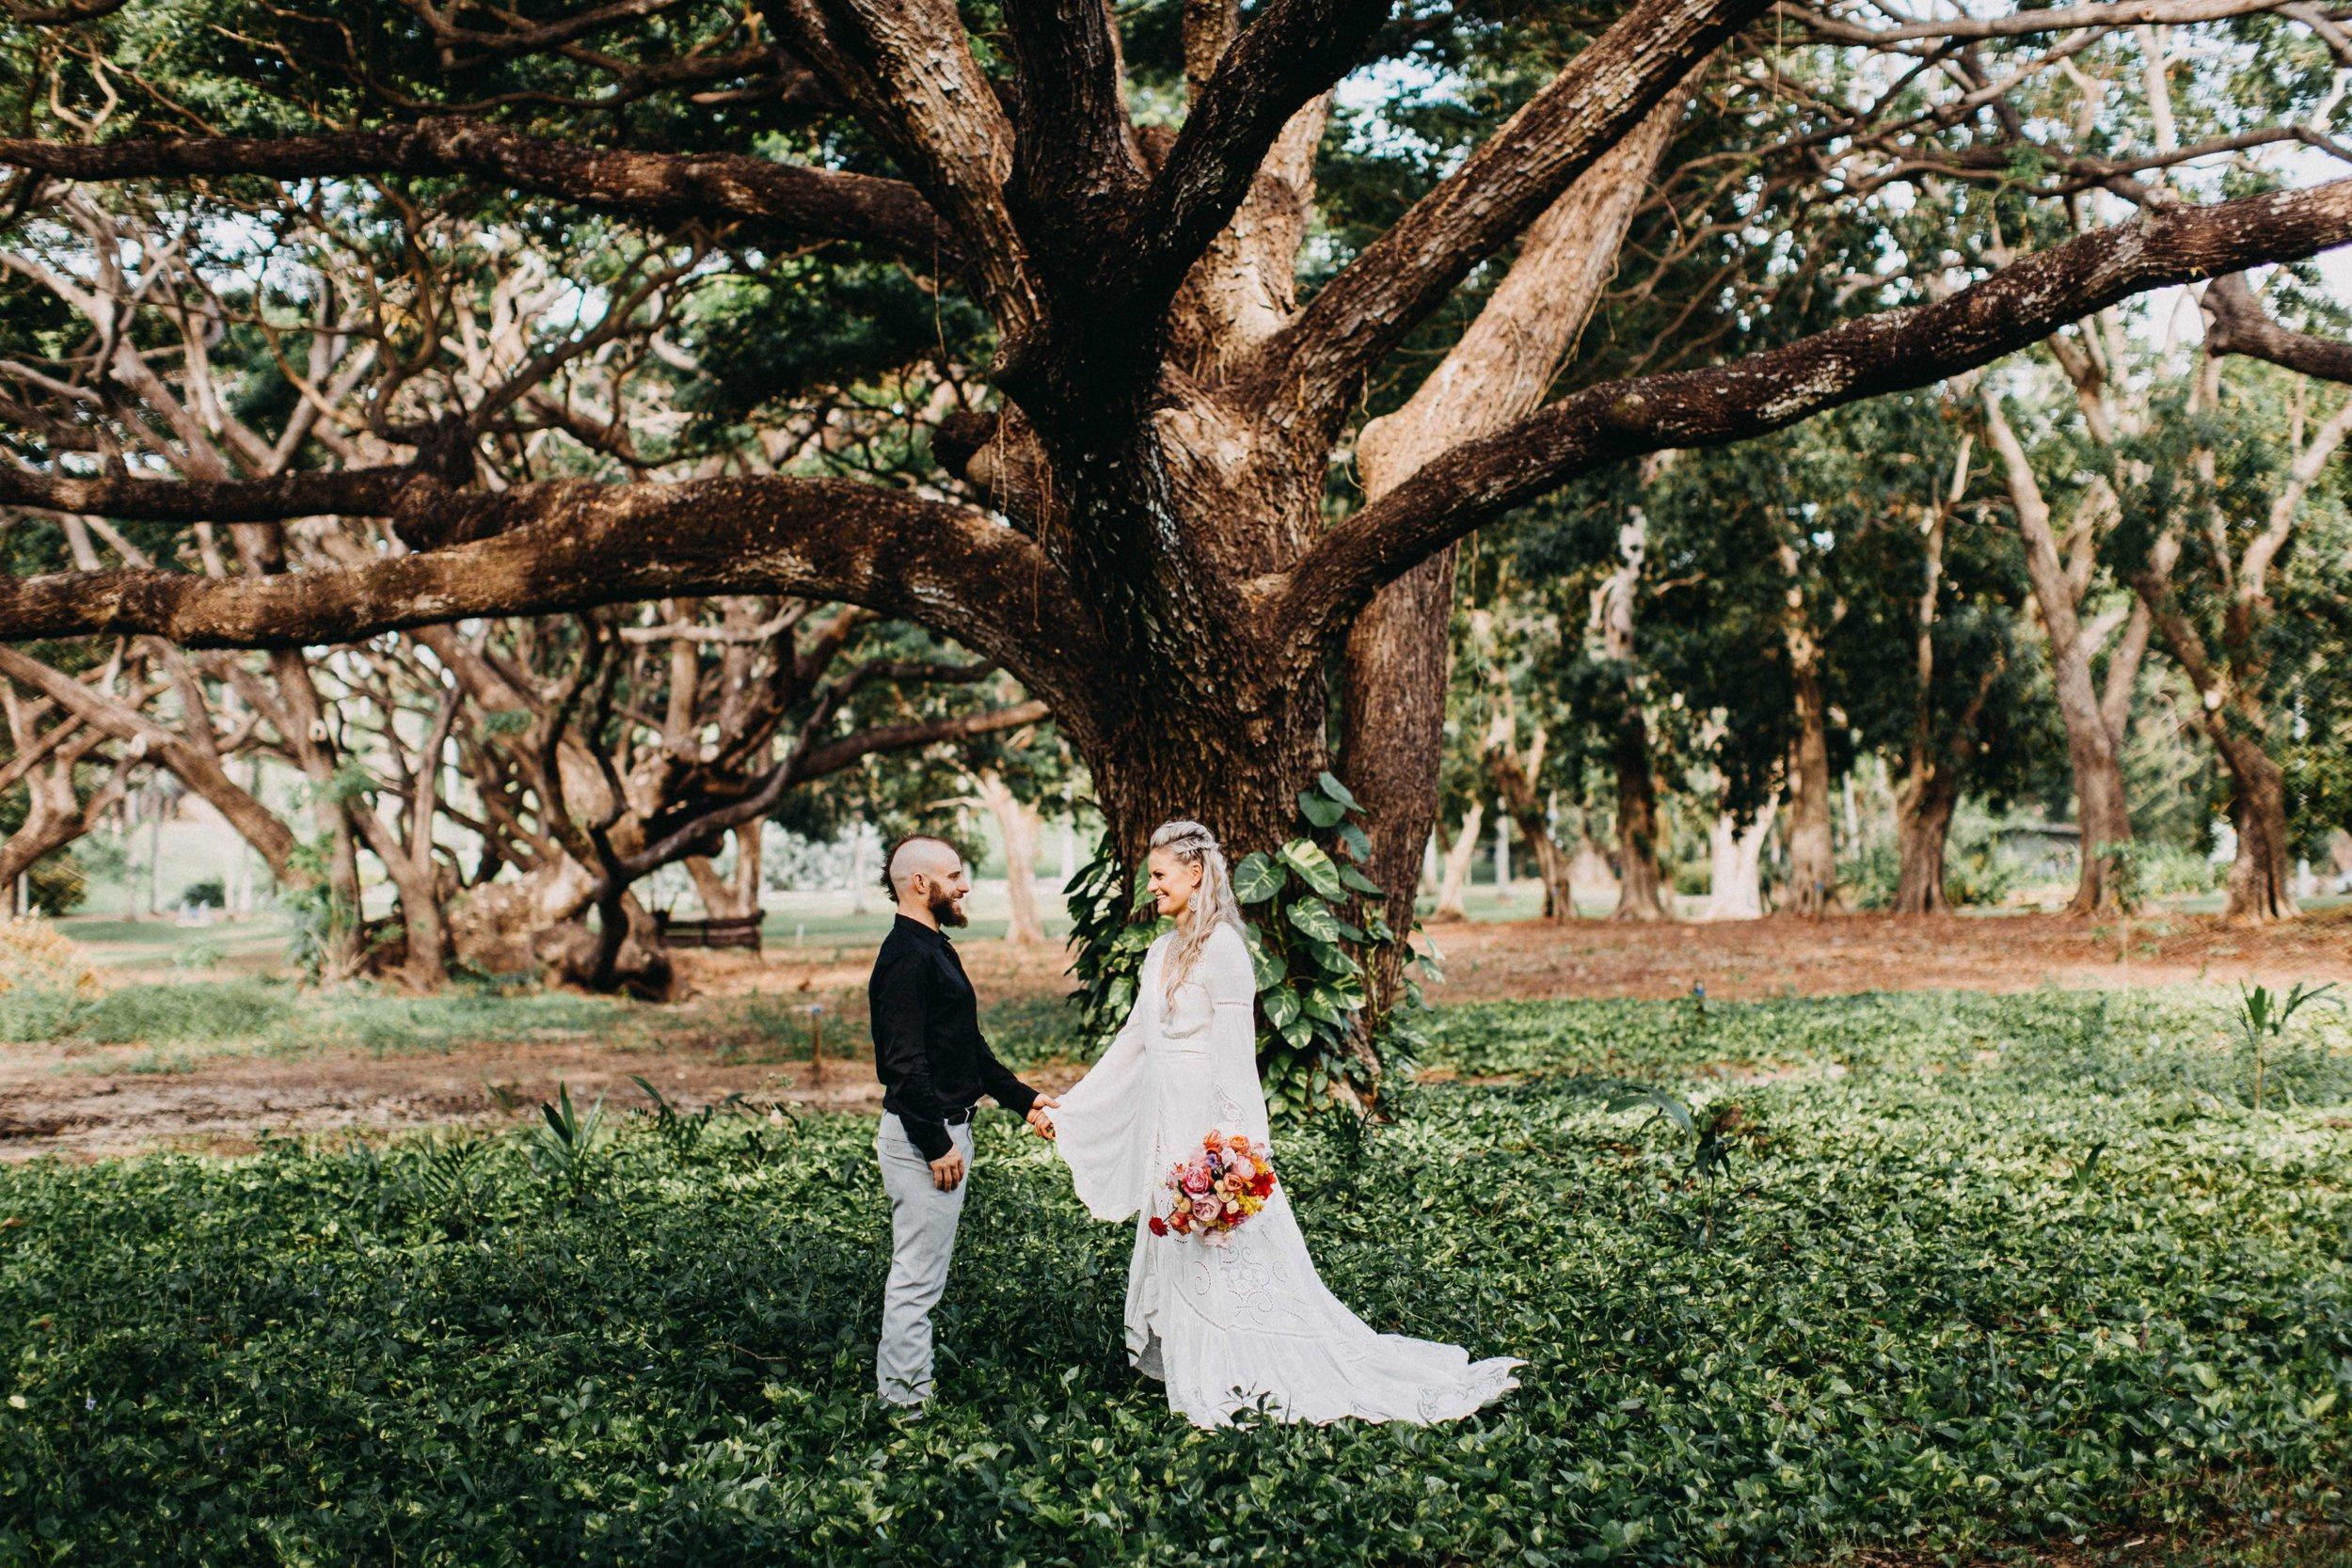 darwin-elopement-wedding-beach-camden-photography-www.emilyobrienphotography.net-33.jpg